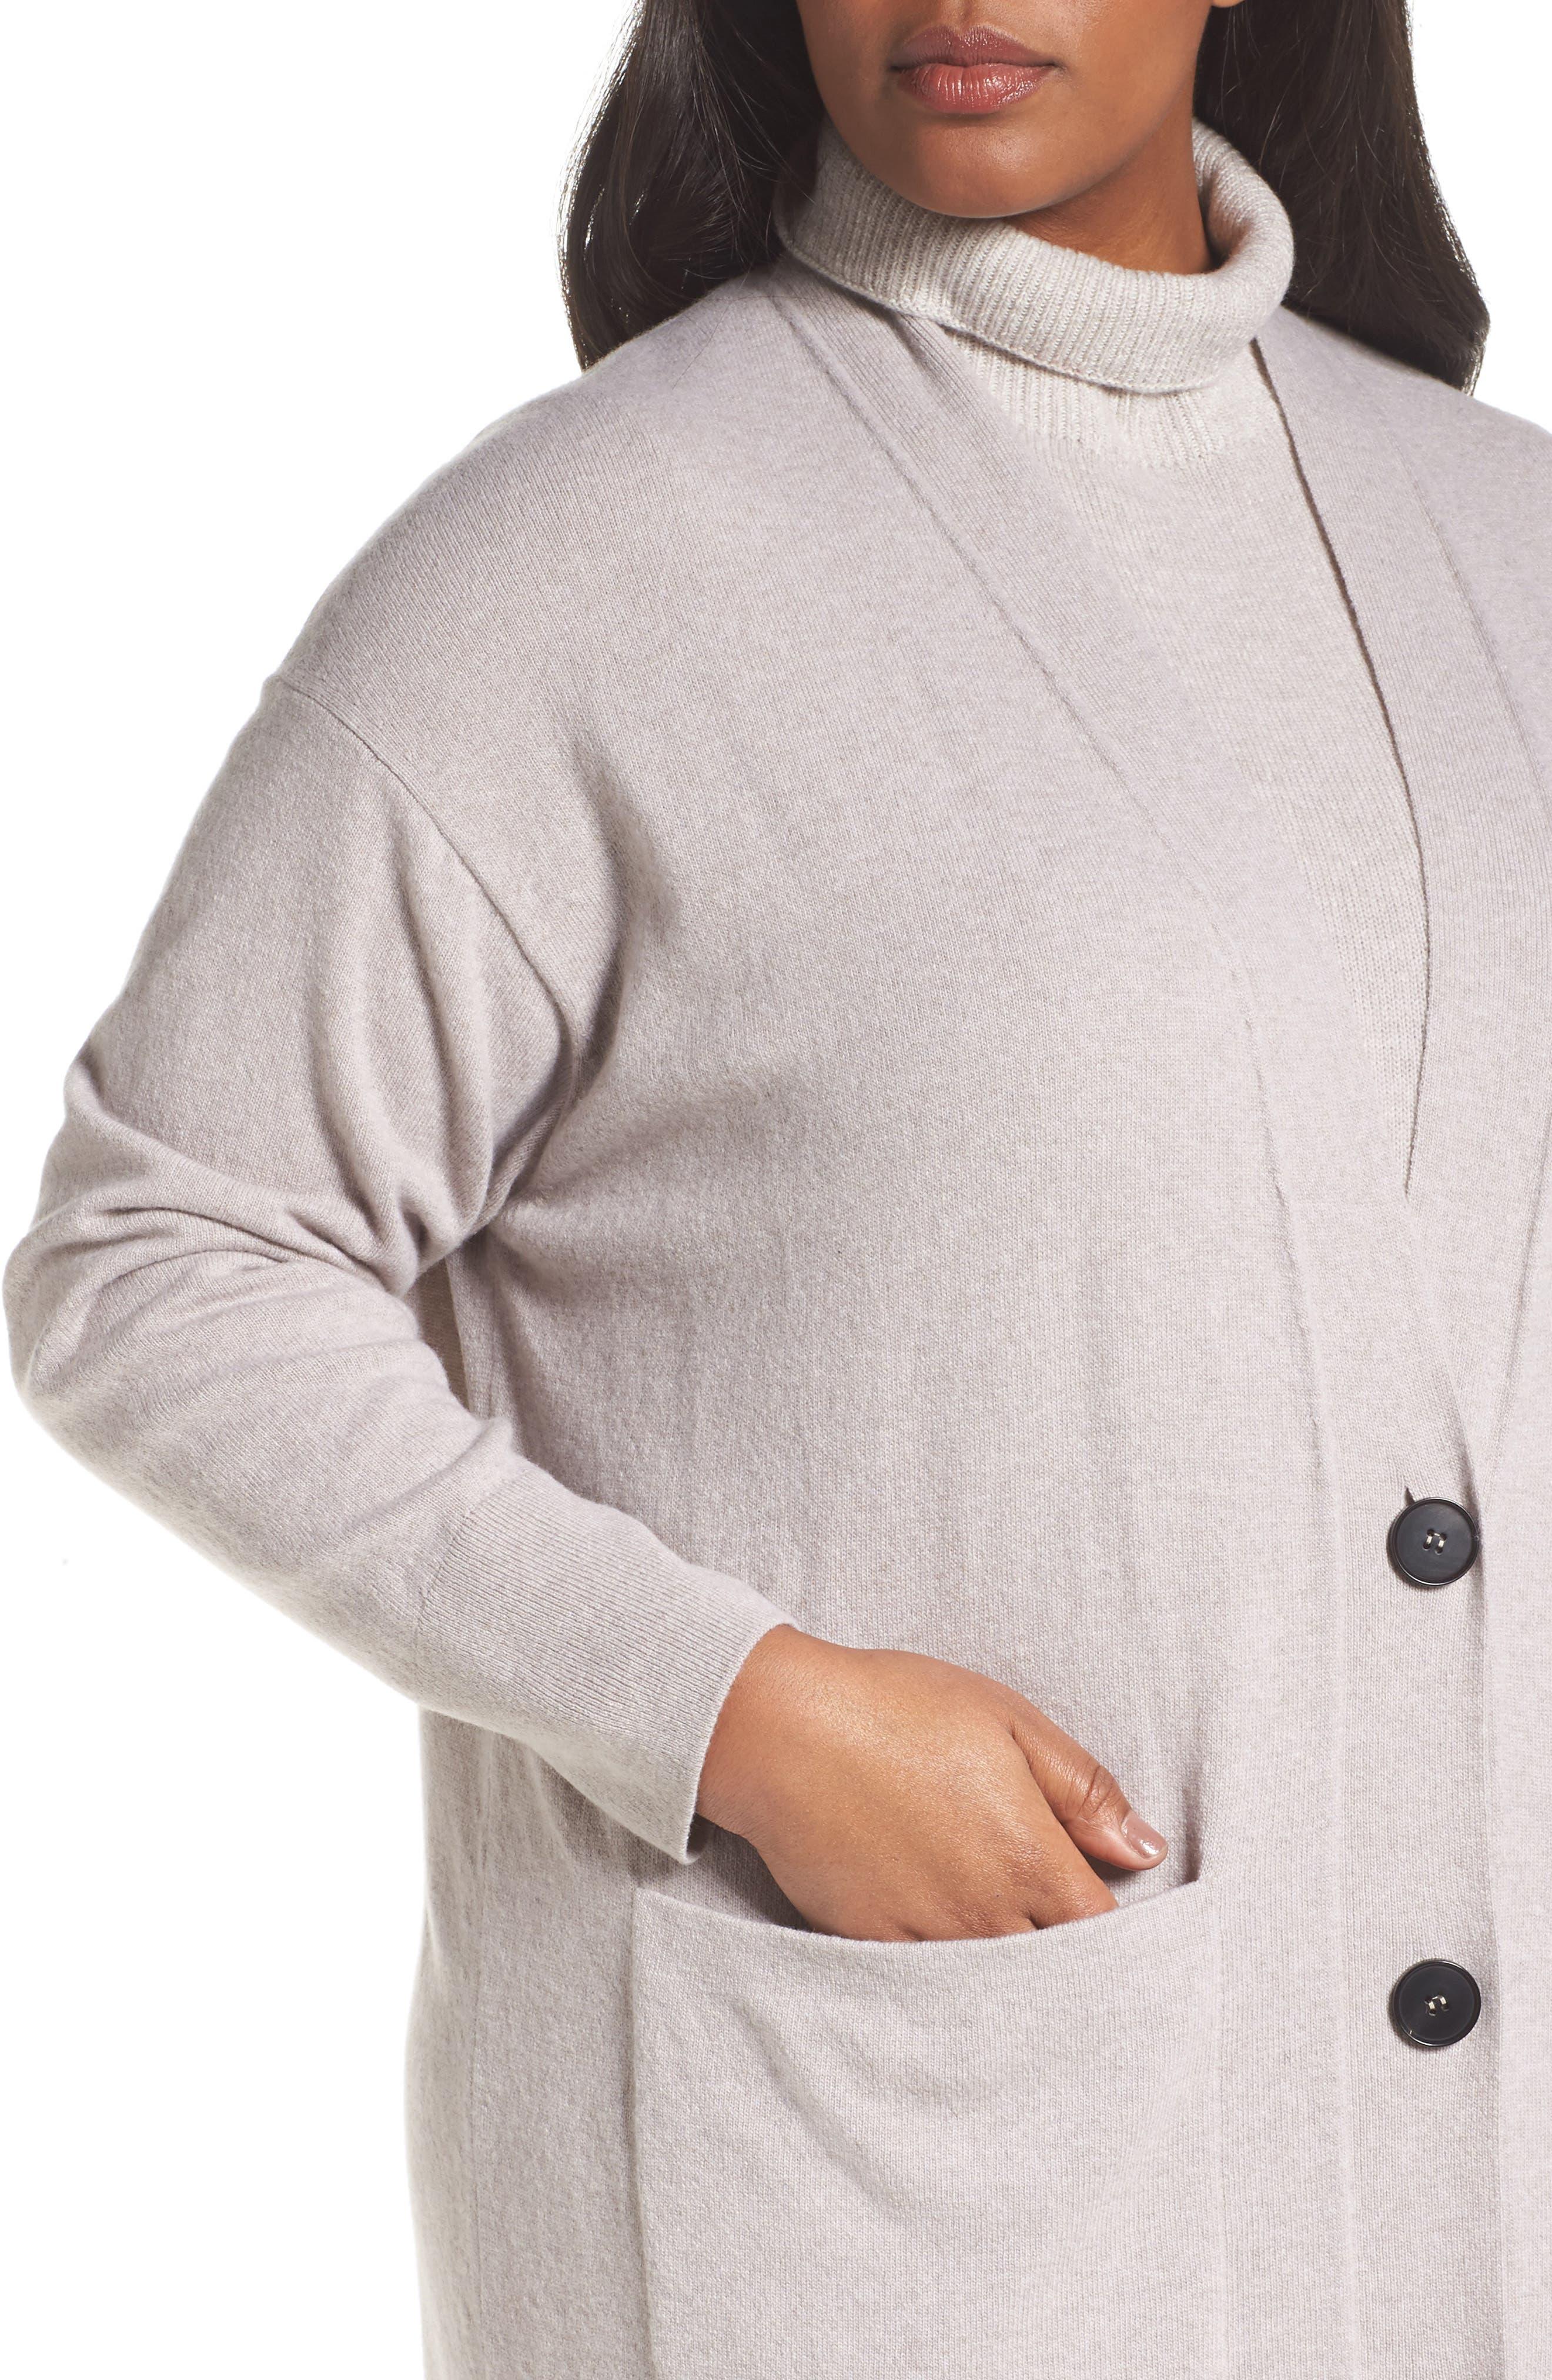 Long Merino Wool & Cashmere Cardigan,                             Alternate thumbnail 4, color,                             Luxor Melange